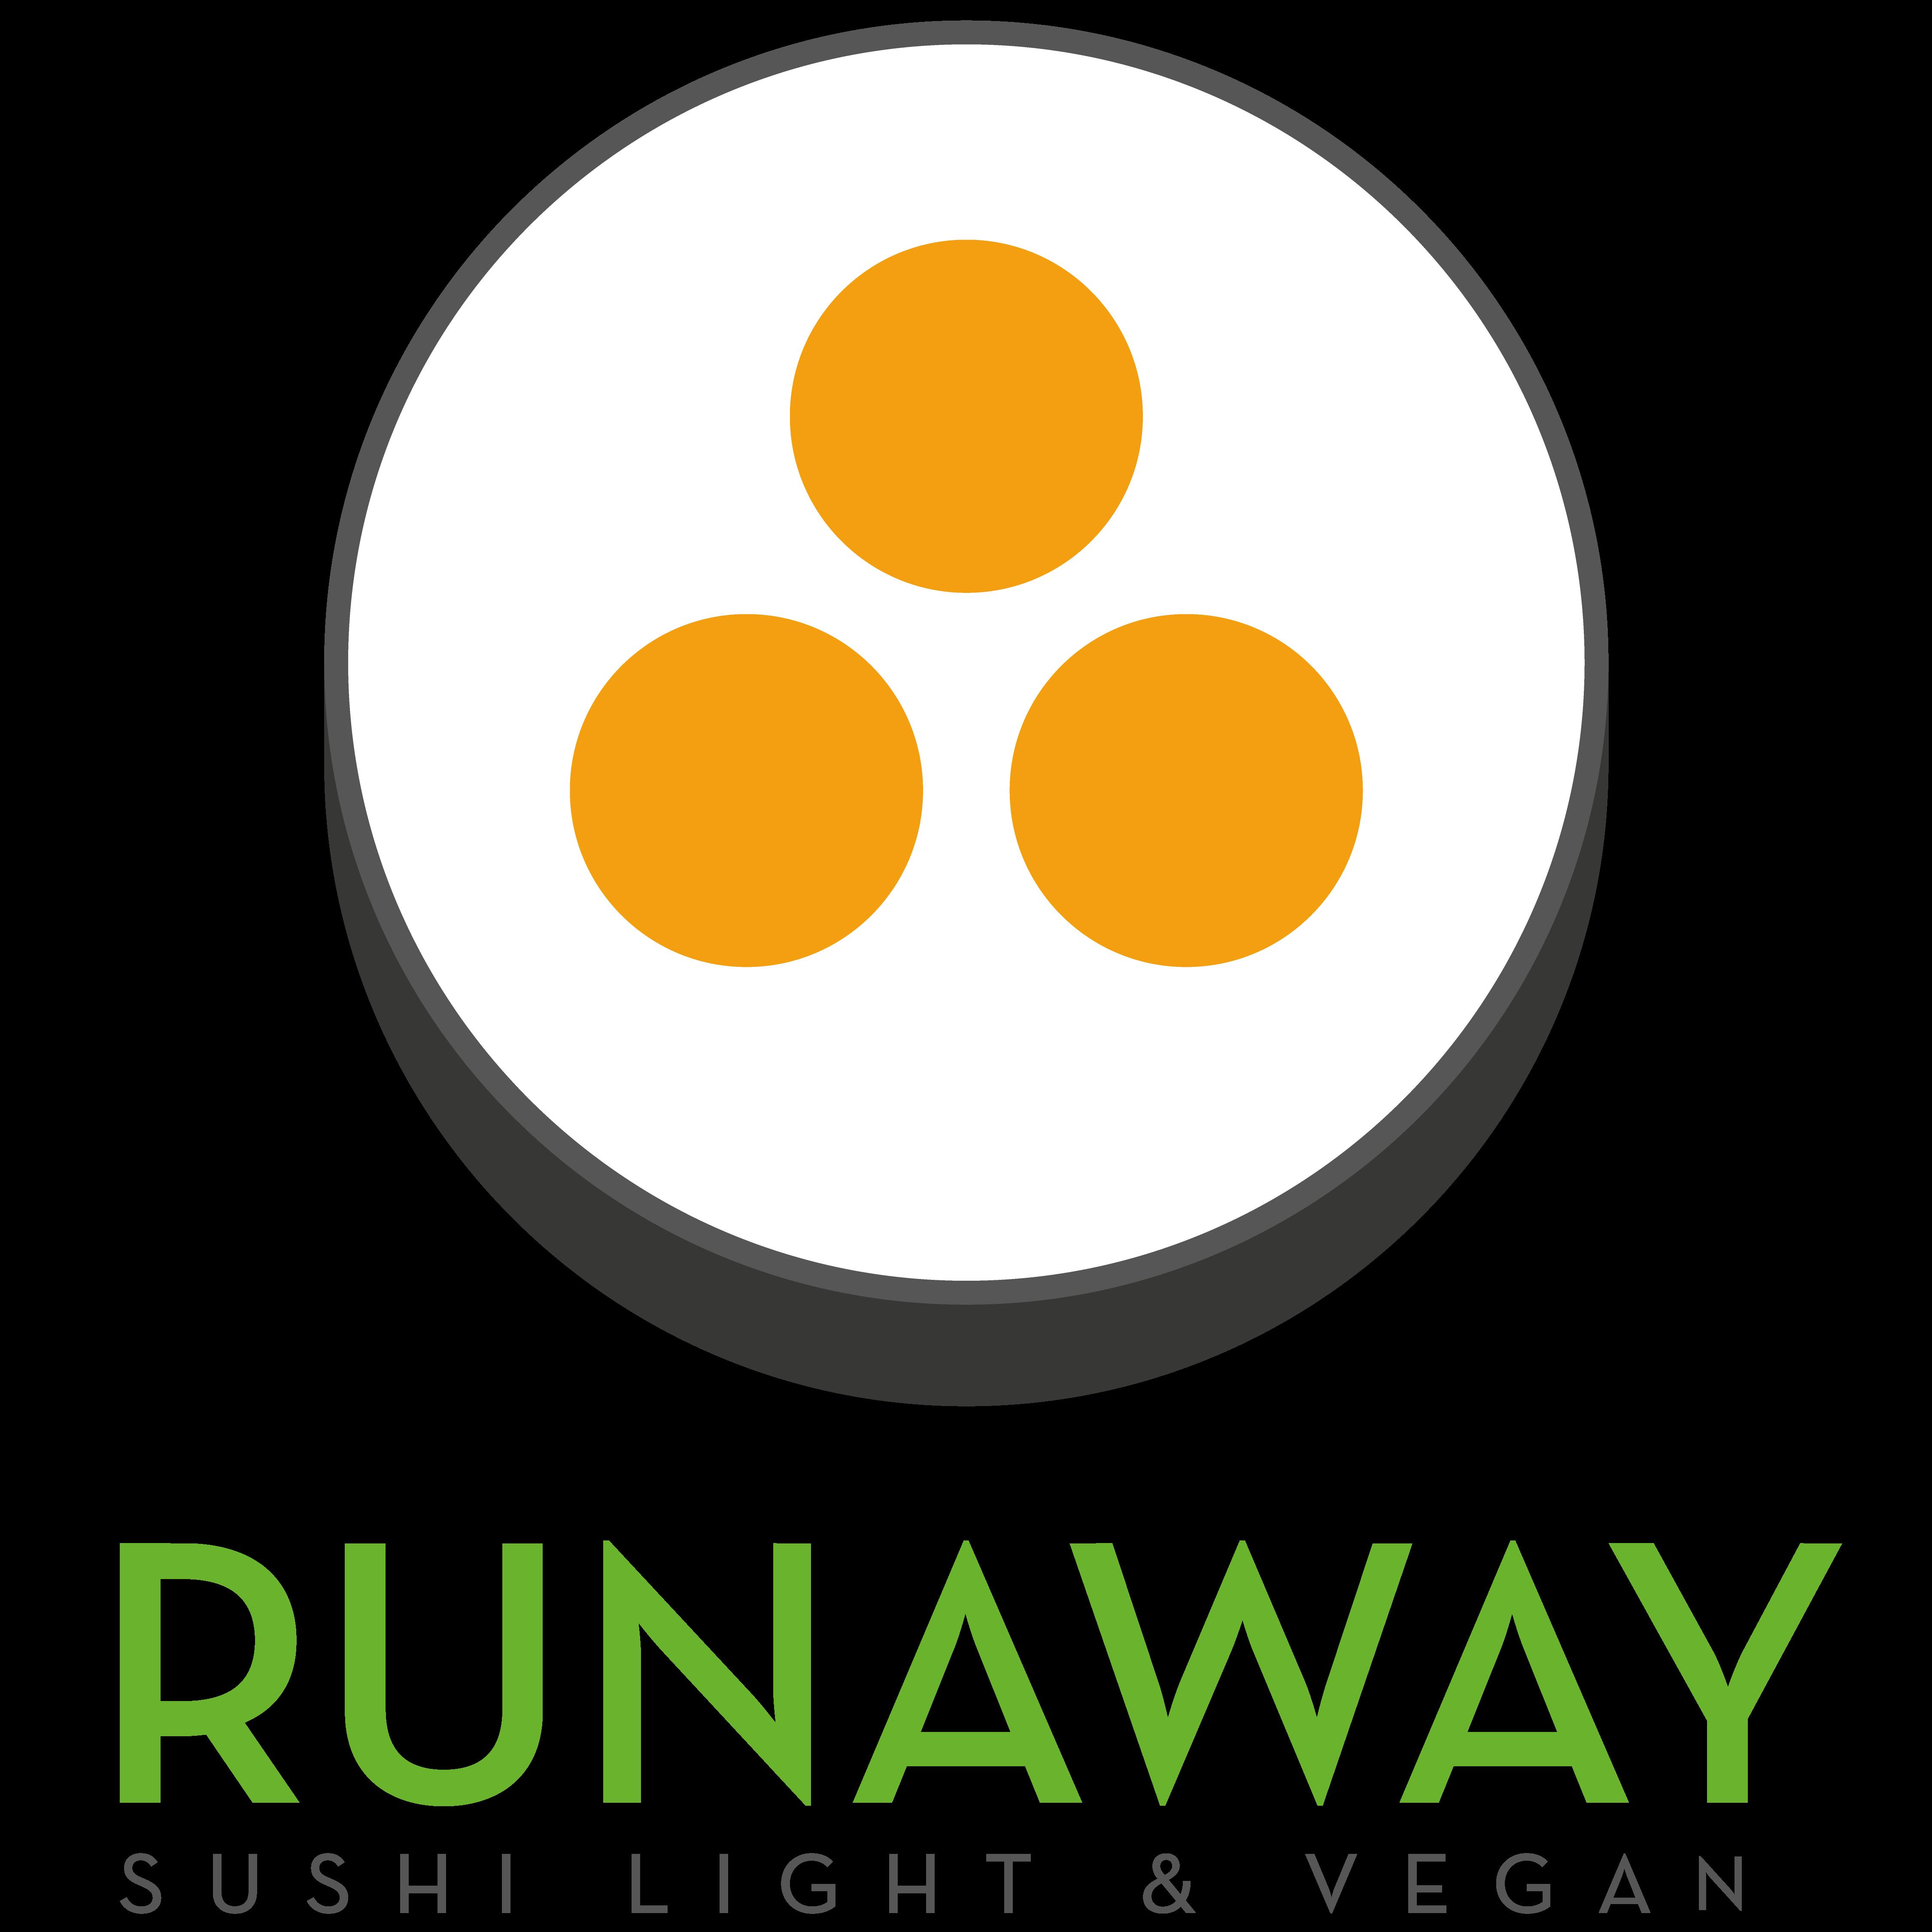 Runaway Sushi